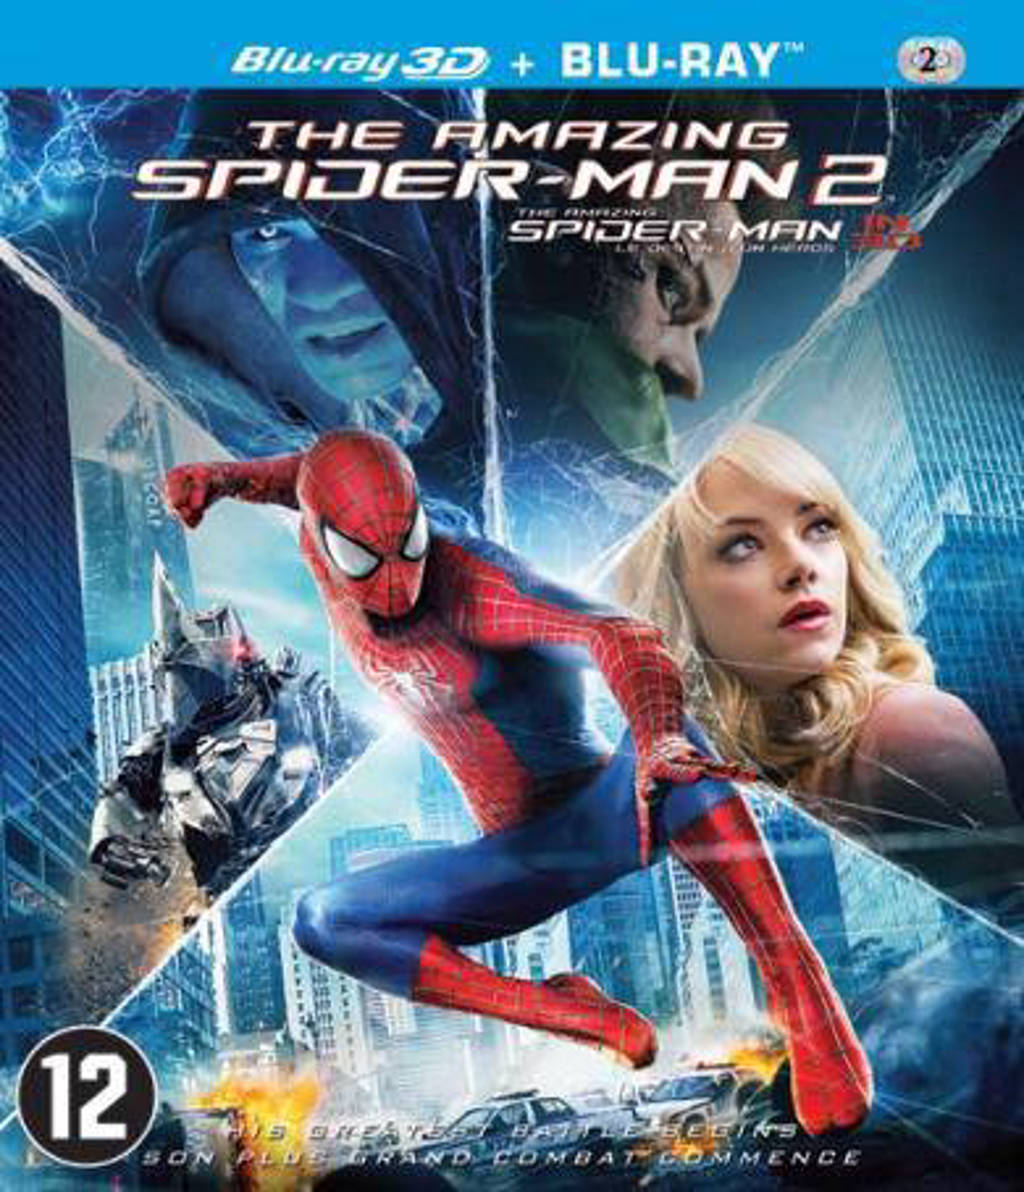 Amazing Spider-man 2 (3D) (Blu-ray)